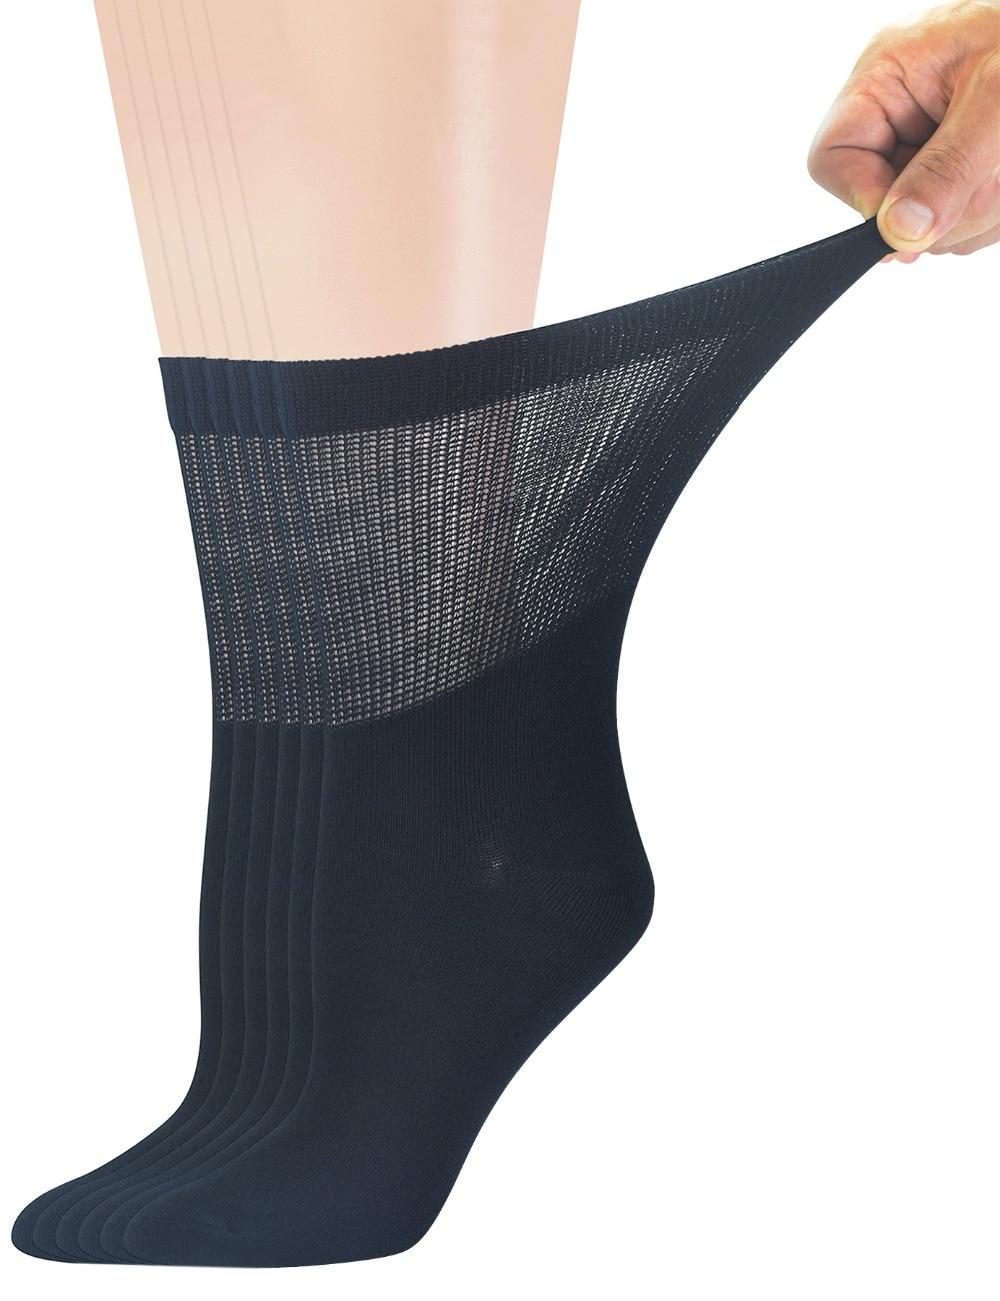 Womens Diabetic Solid Black Socks 1